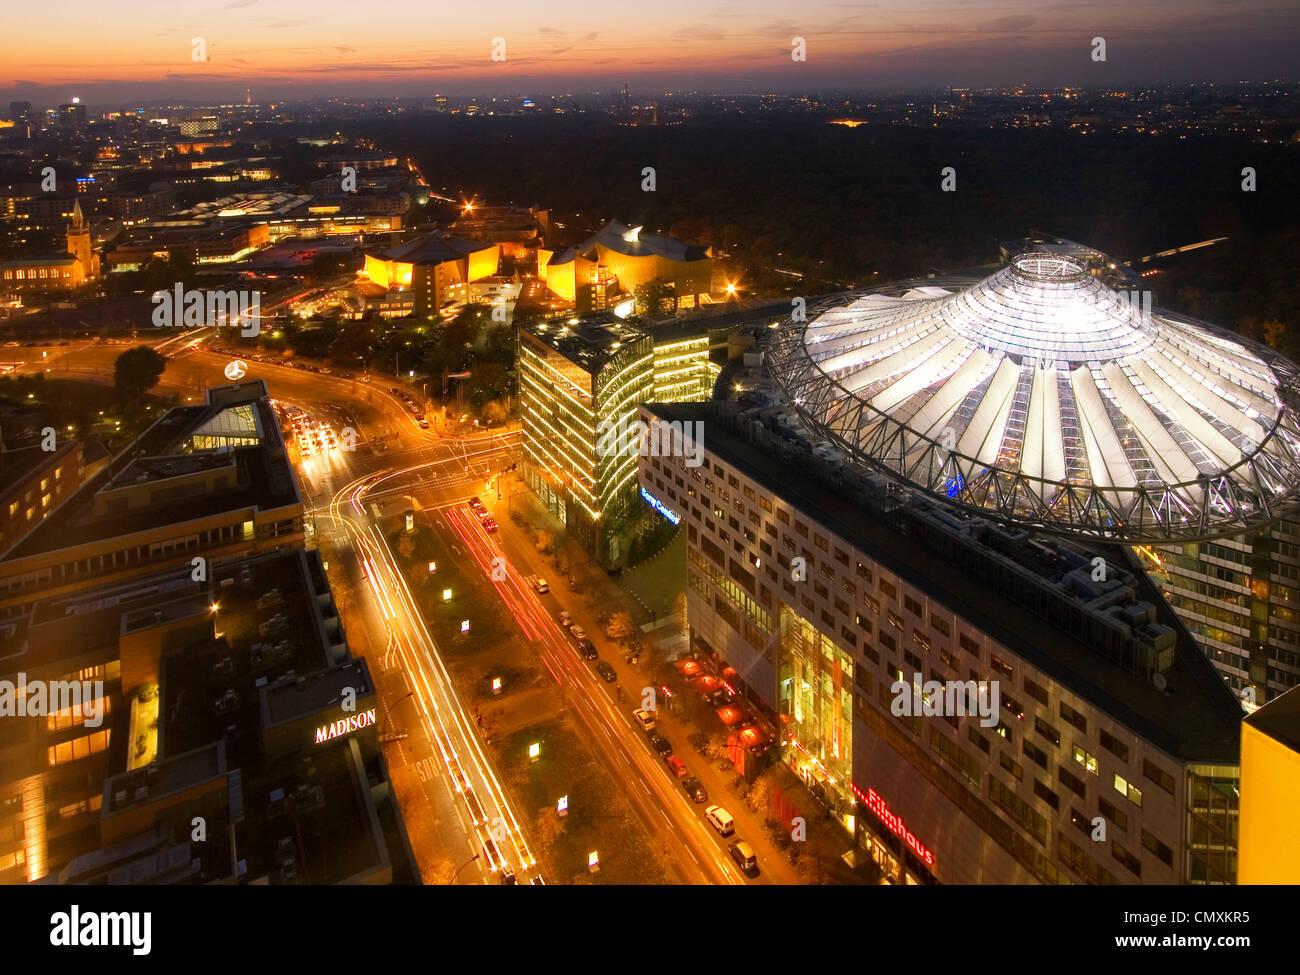 Aerial view of Sony Center, Potsdamer Platz, Berlin - Stock Image